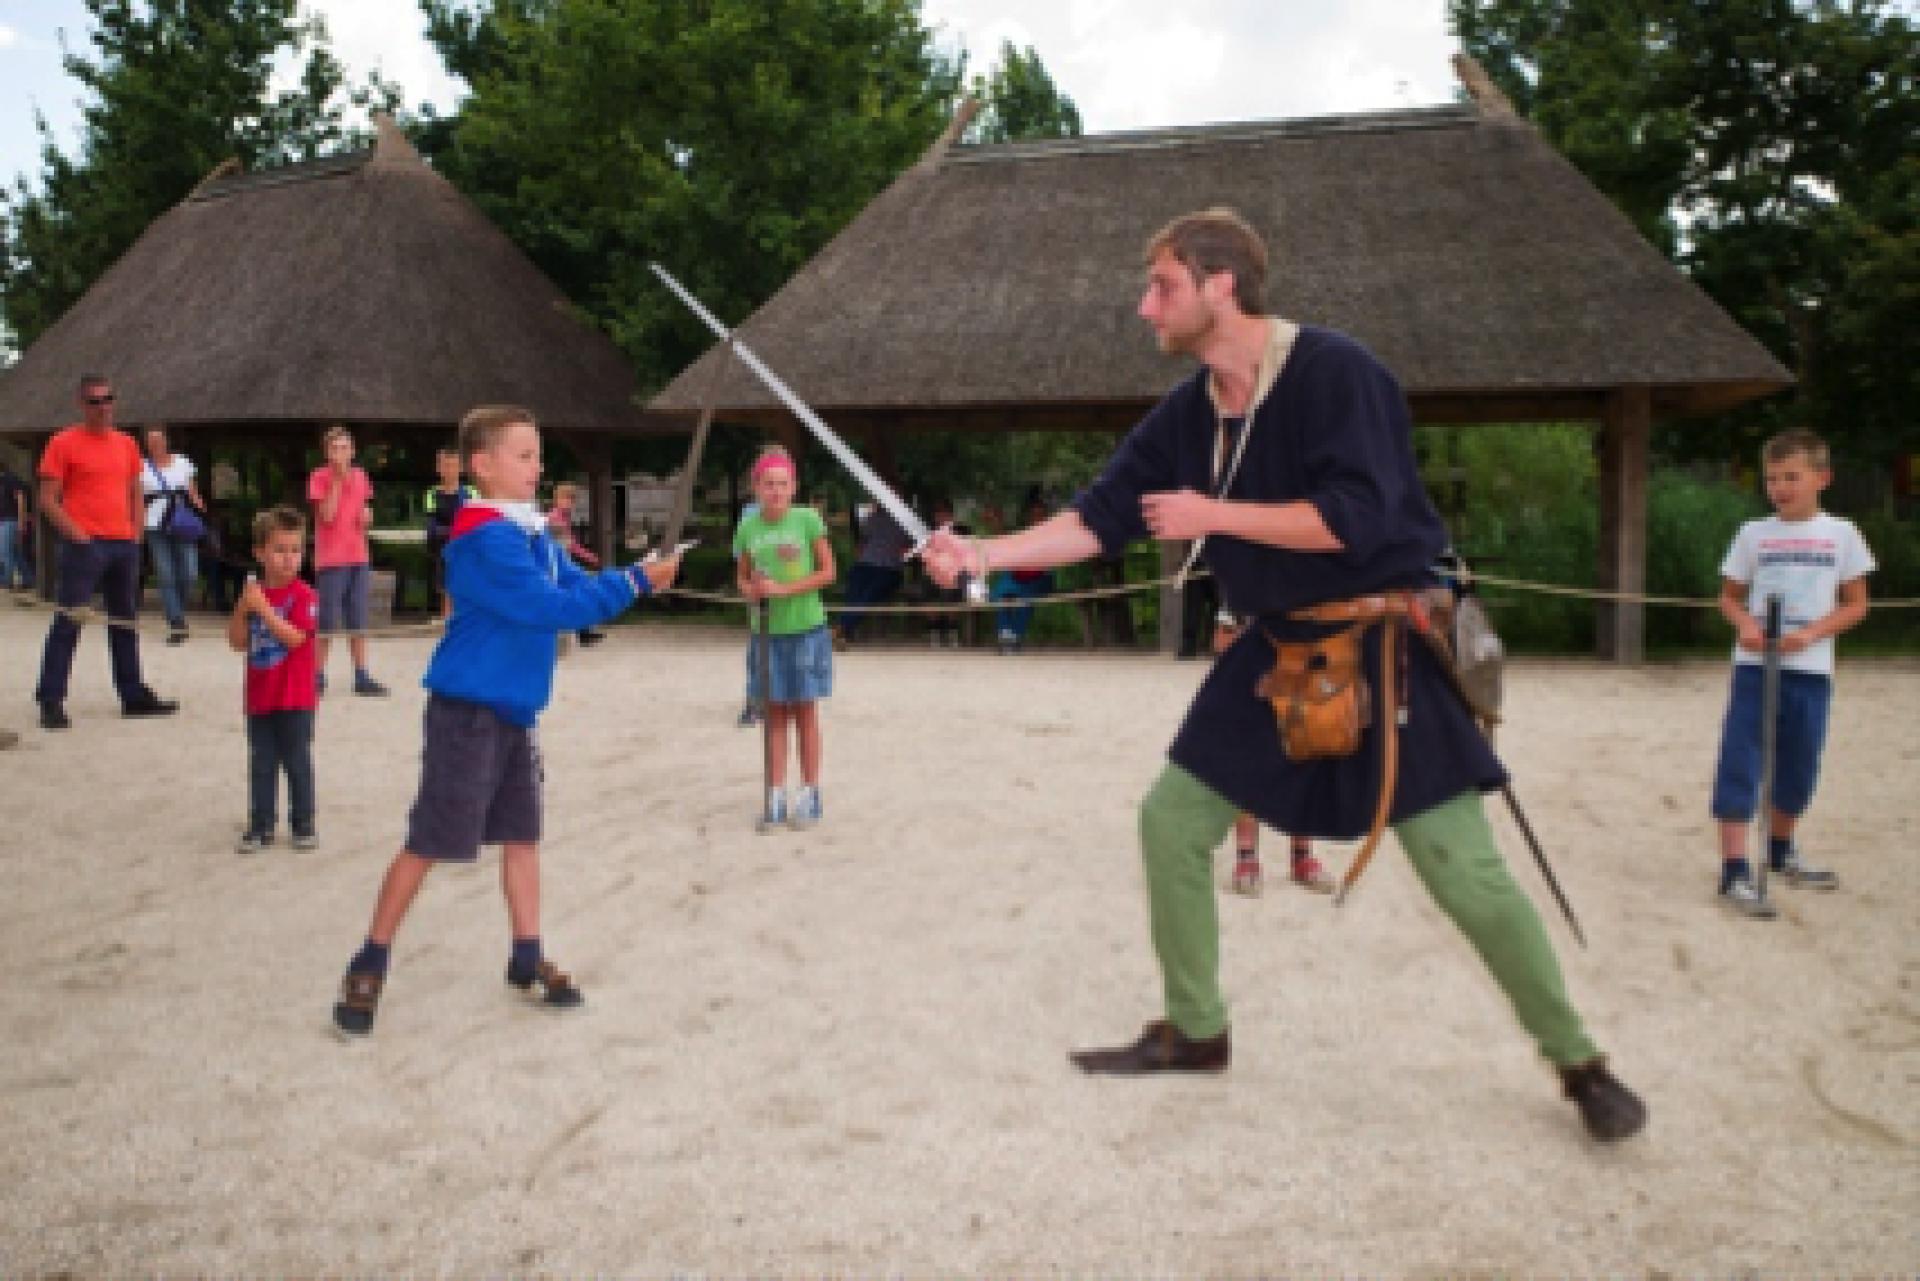 Scouting regio Hollands Midden